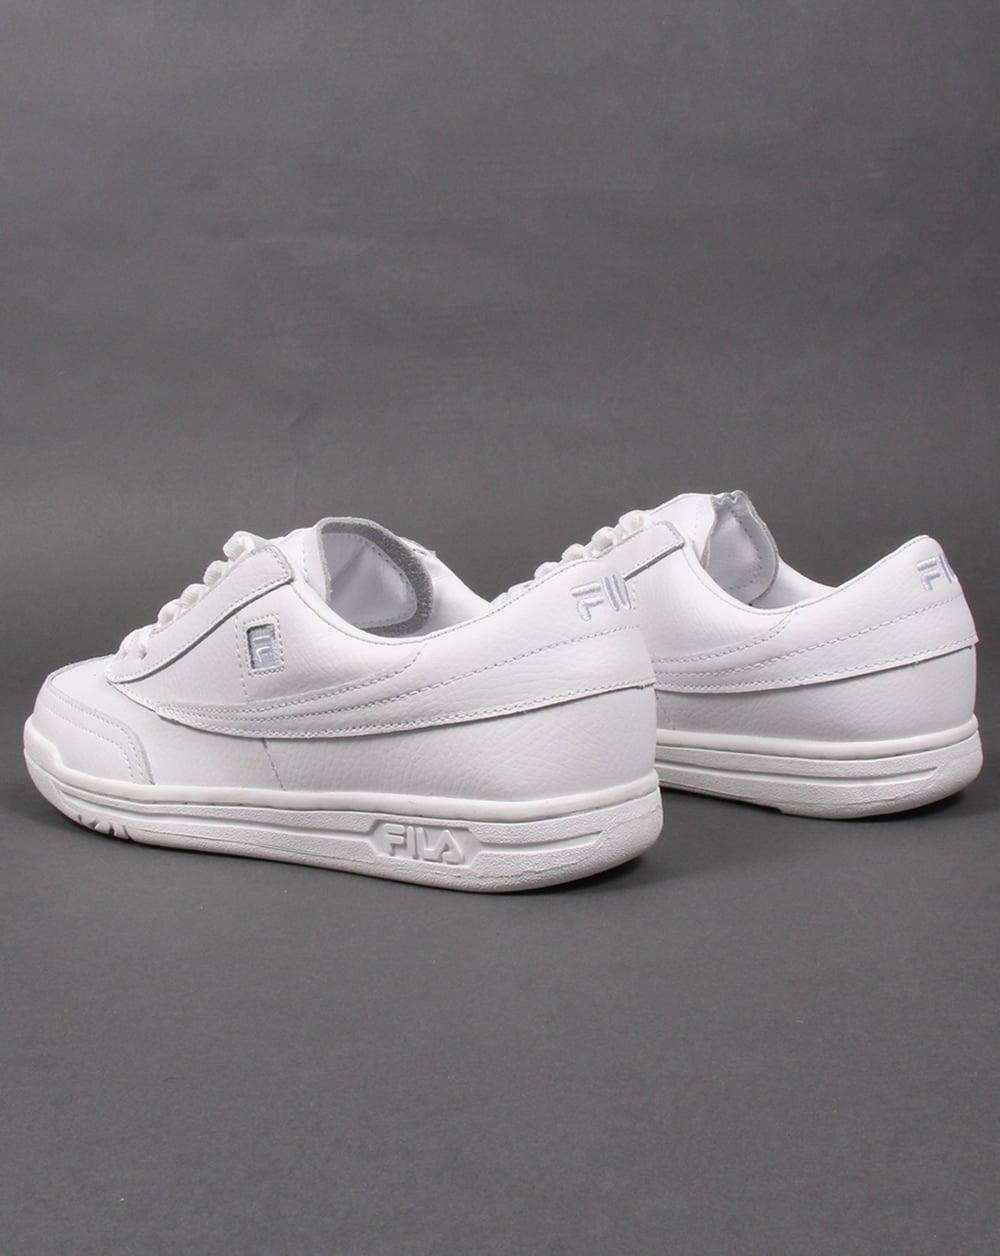 eeef99b3aa3 Fila Vintage Original Tennis Trainers White,shoes,sports,mens